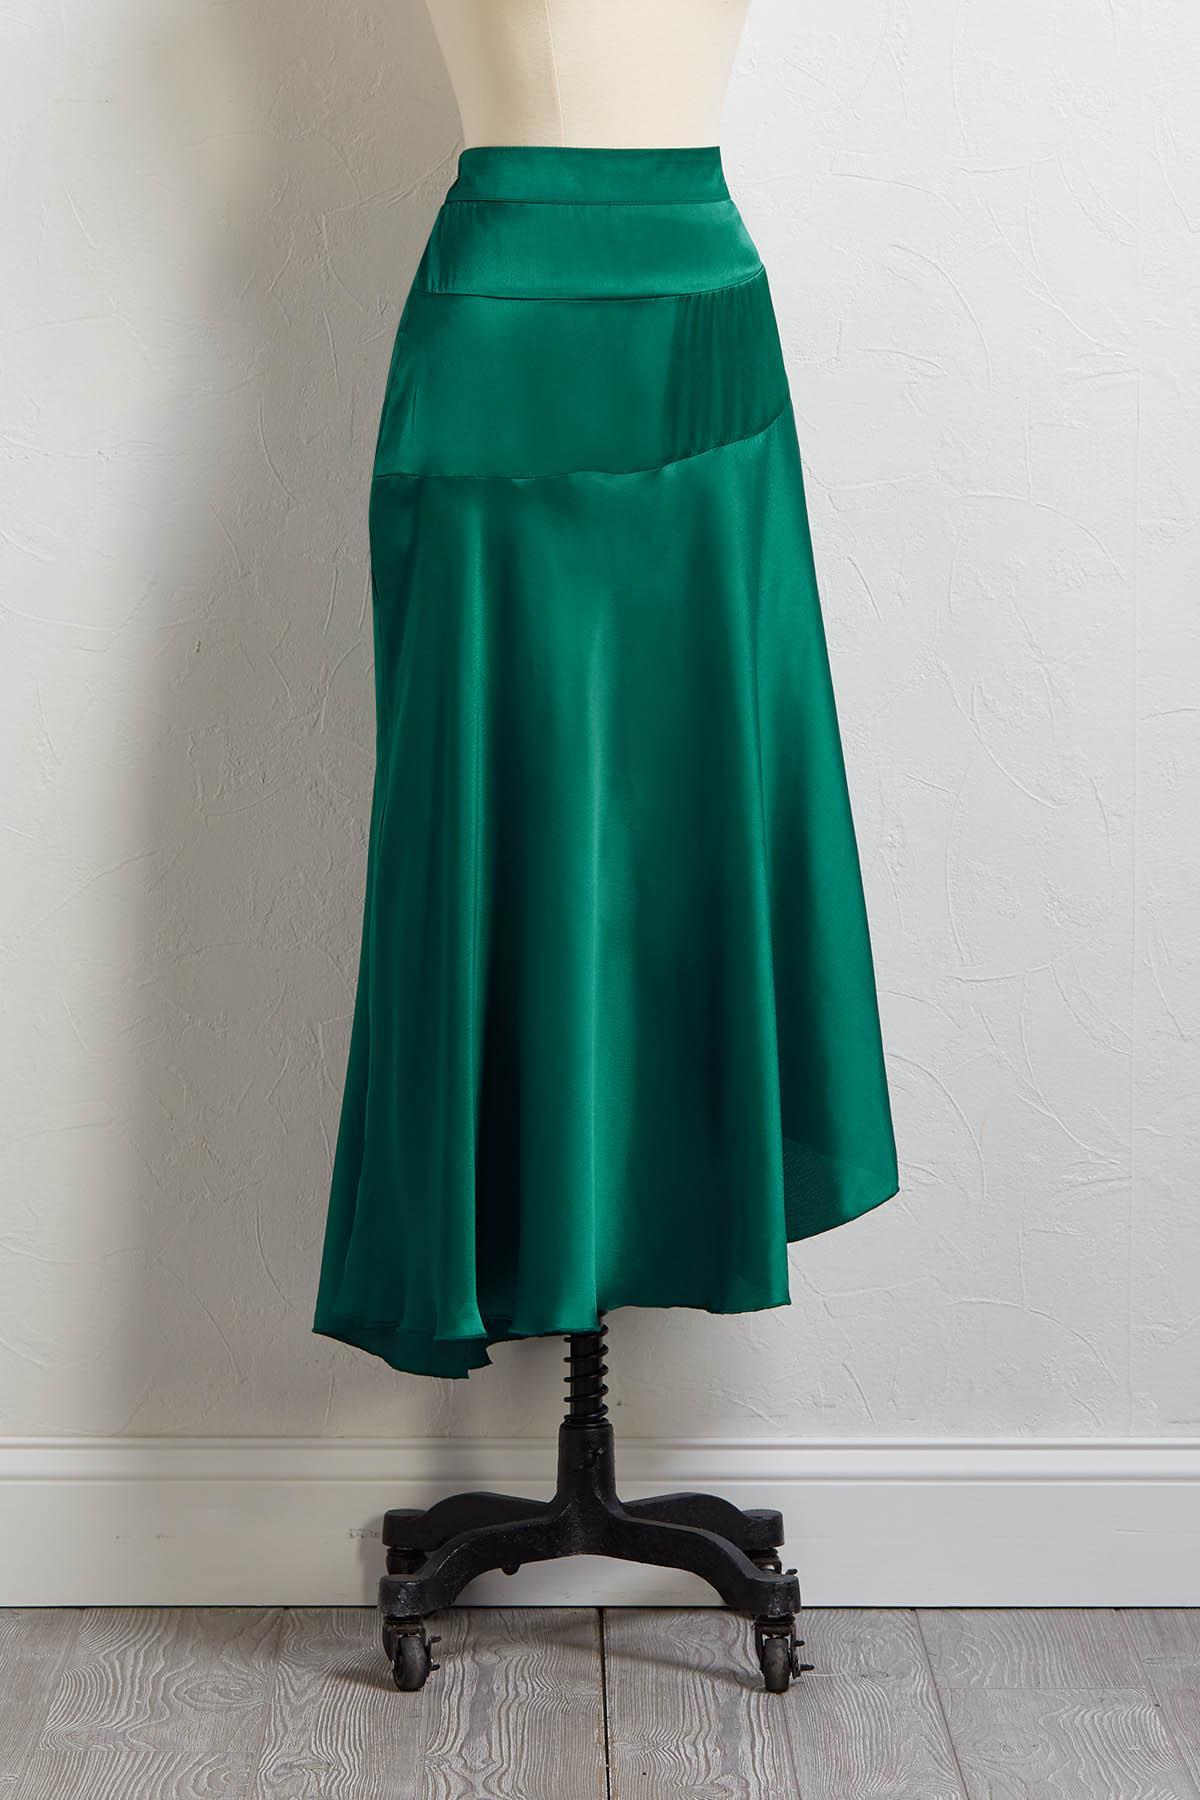 Make It Satin Skirt